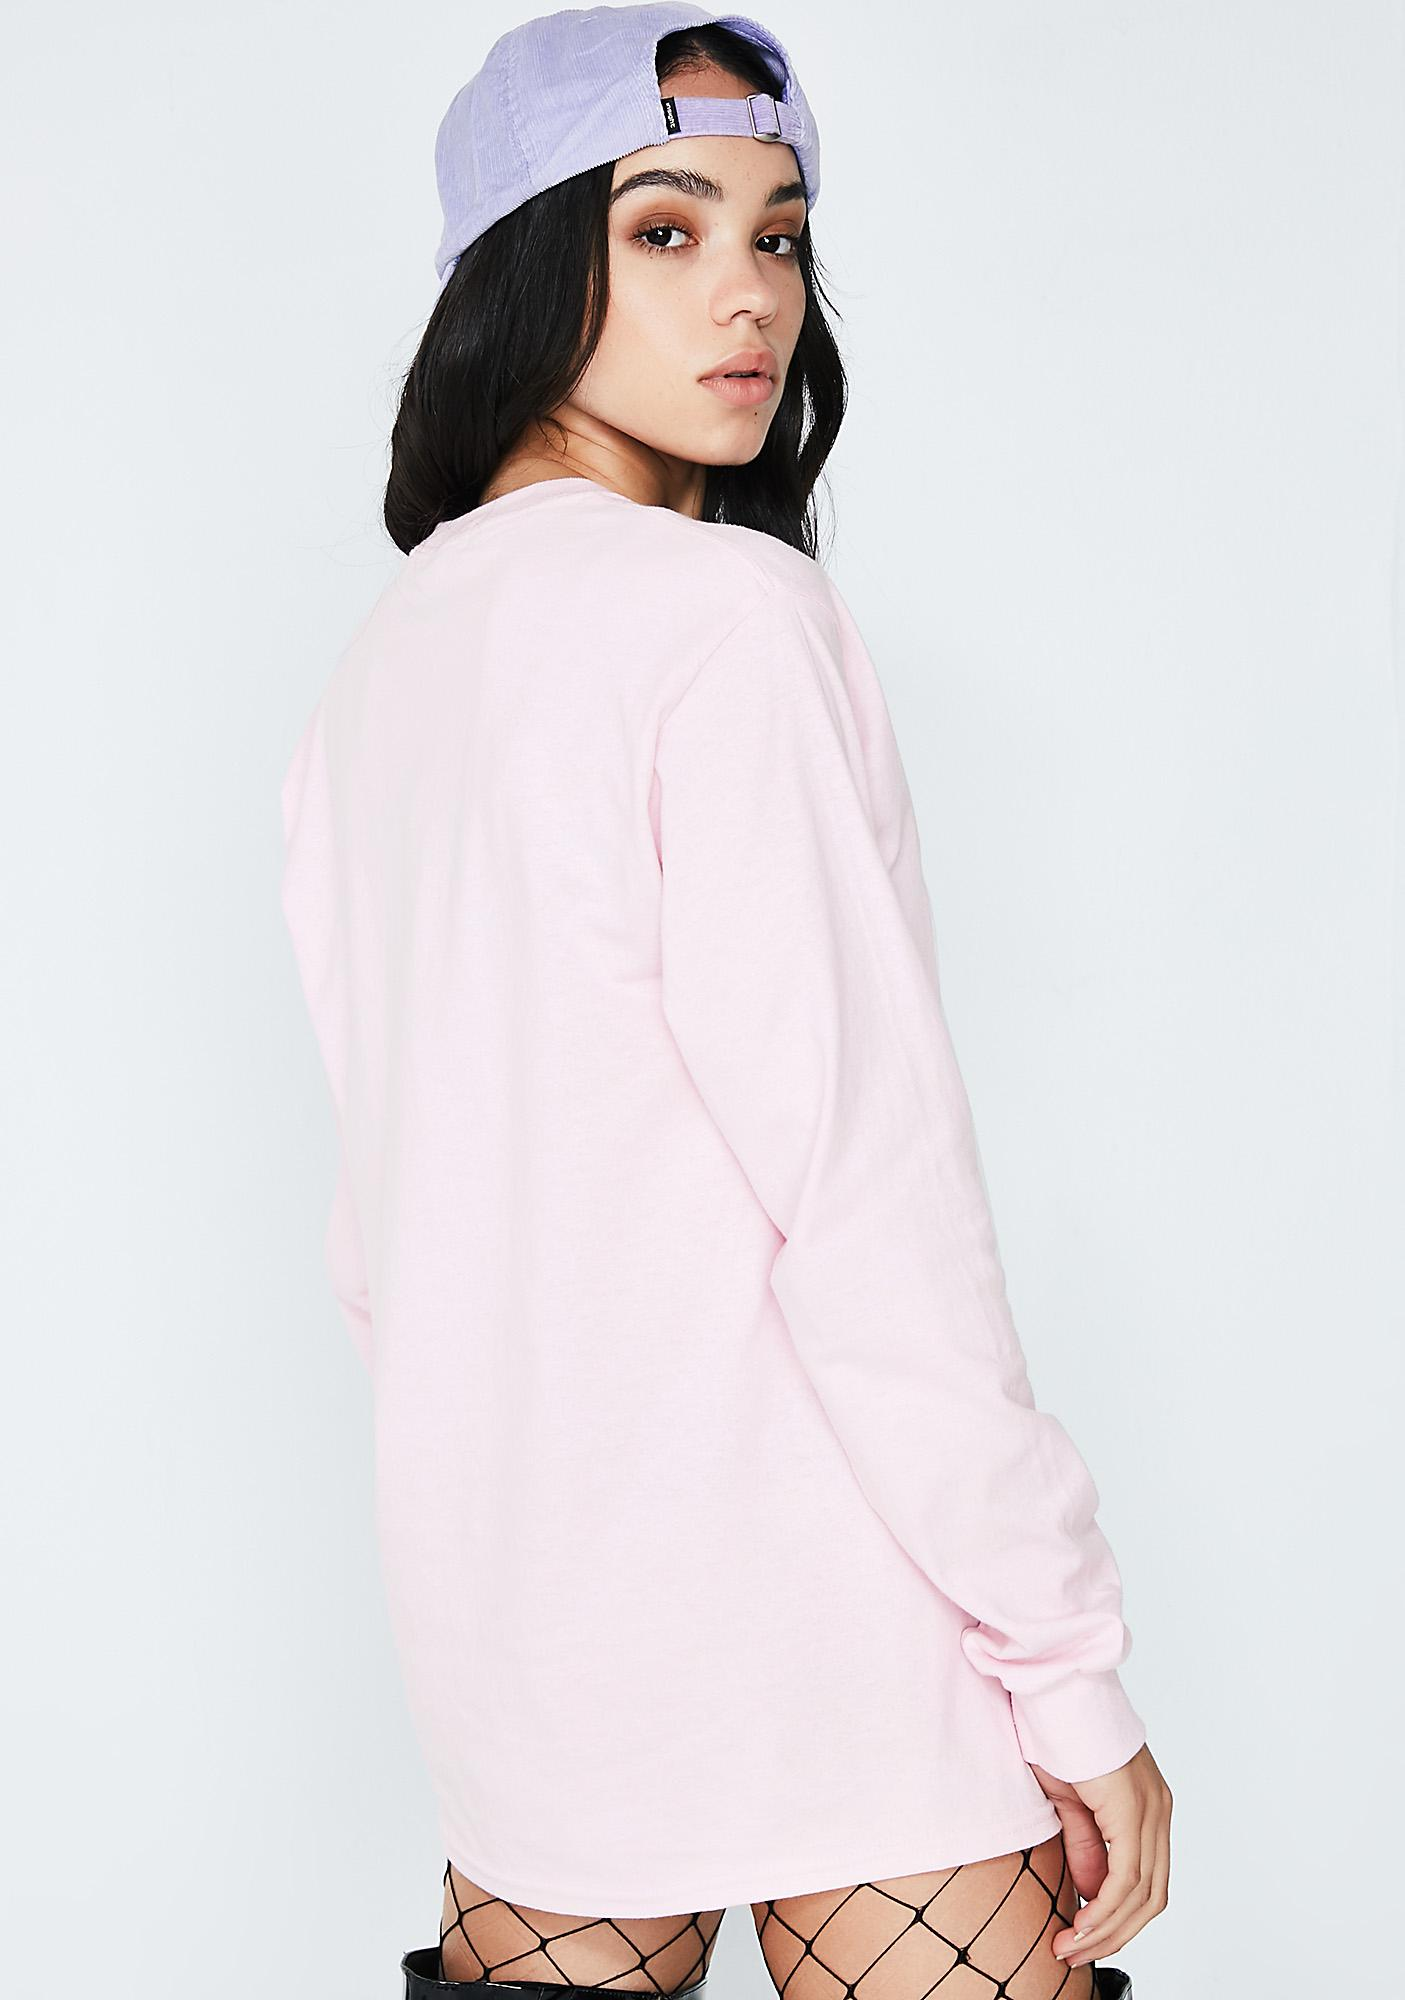 Peachbrain Compton Long Sleeve Shirt